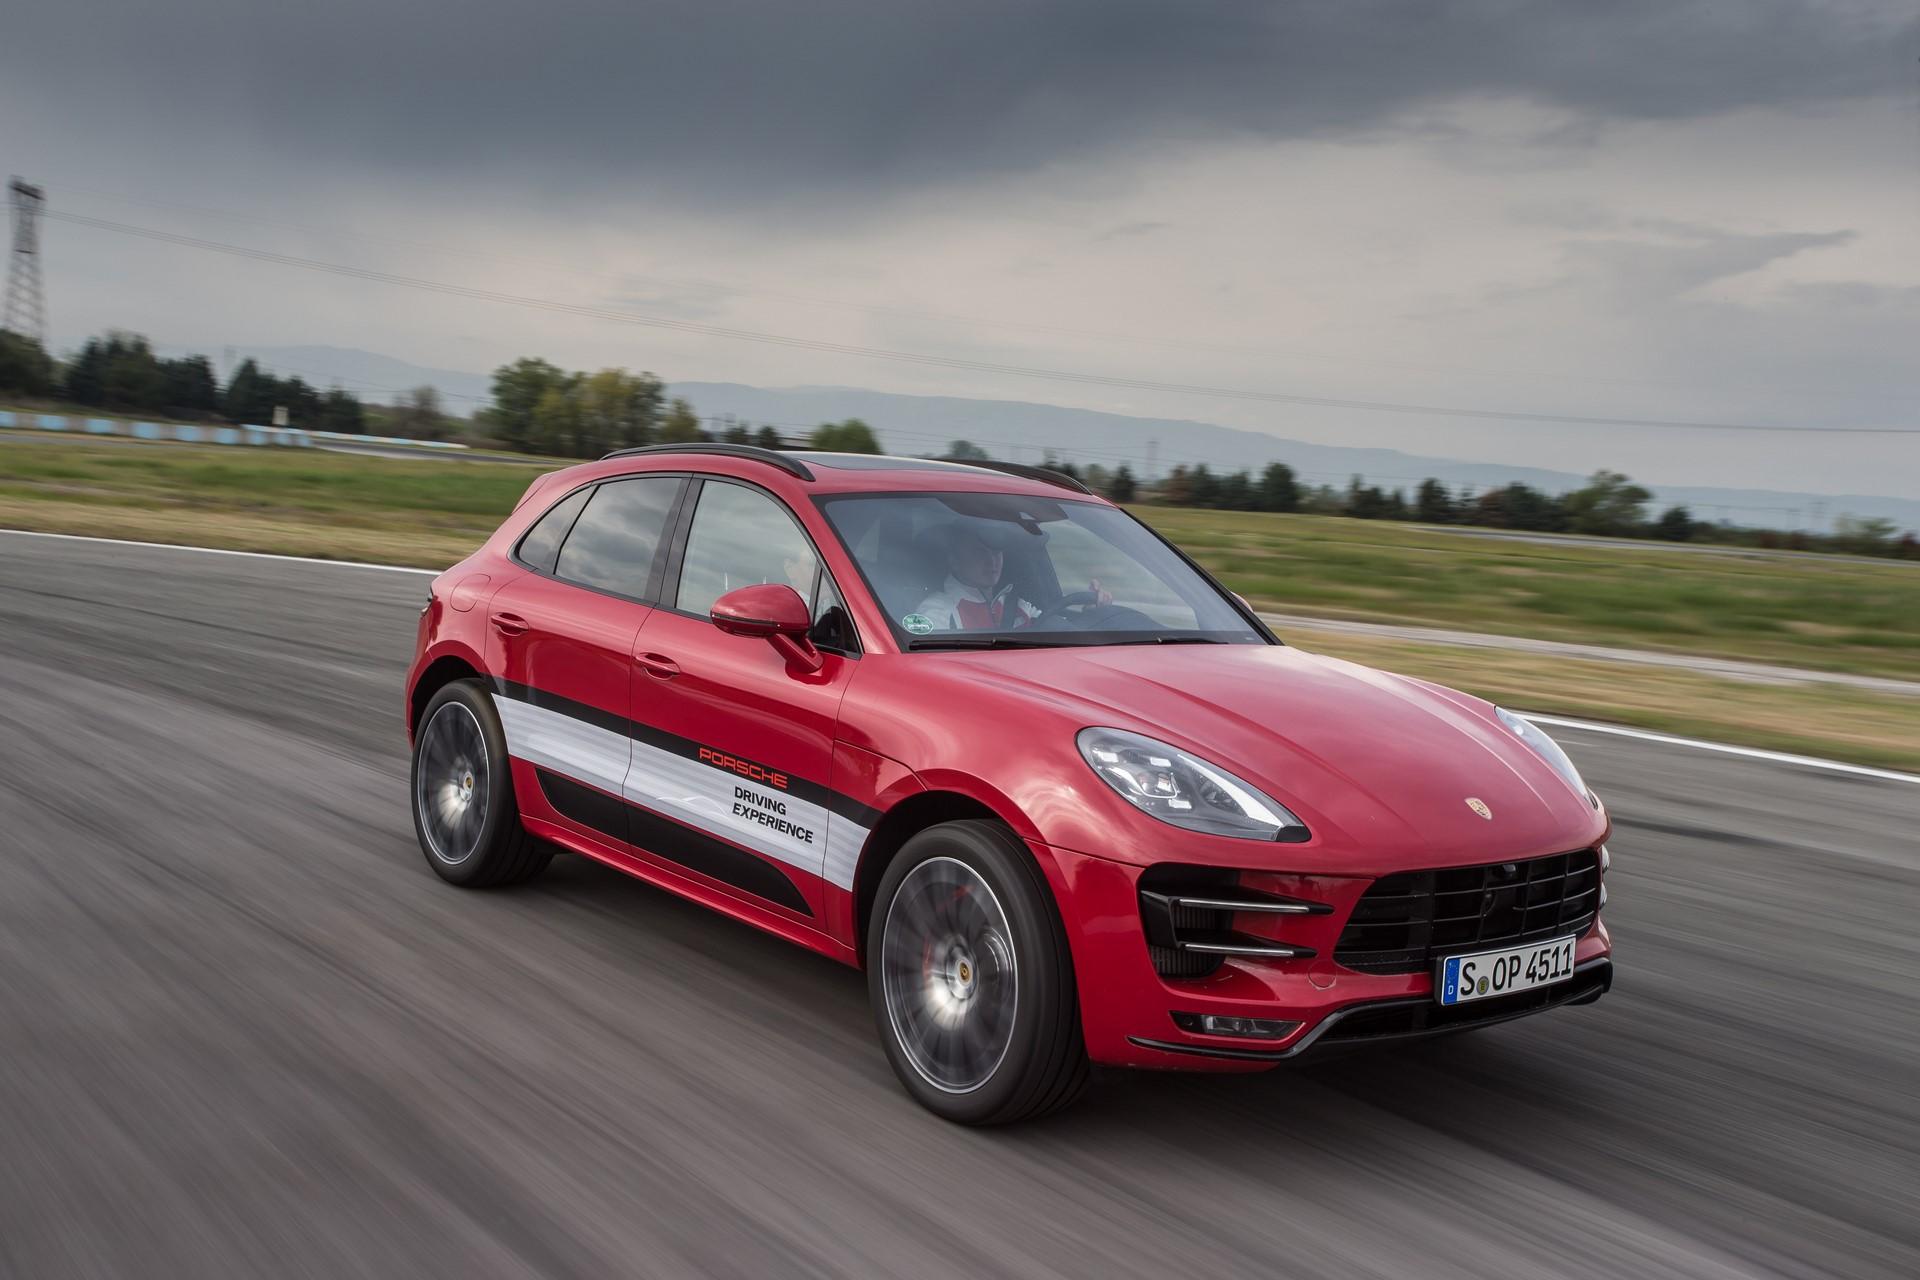 Porsche Driving Experience 2017 Serres (57)